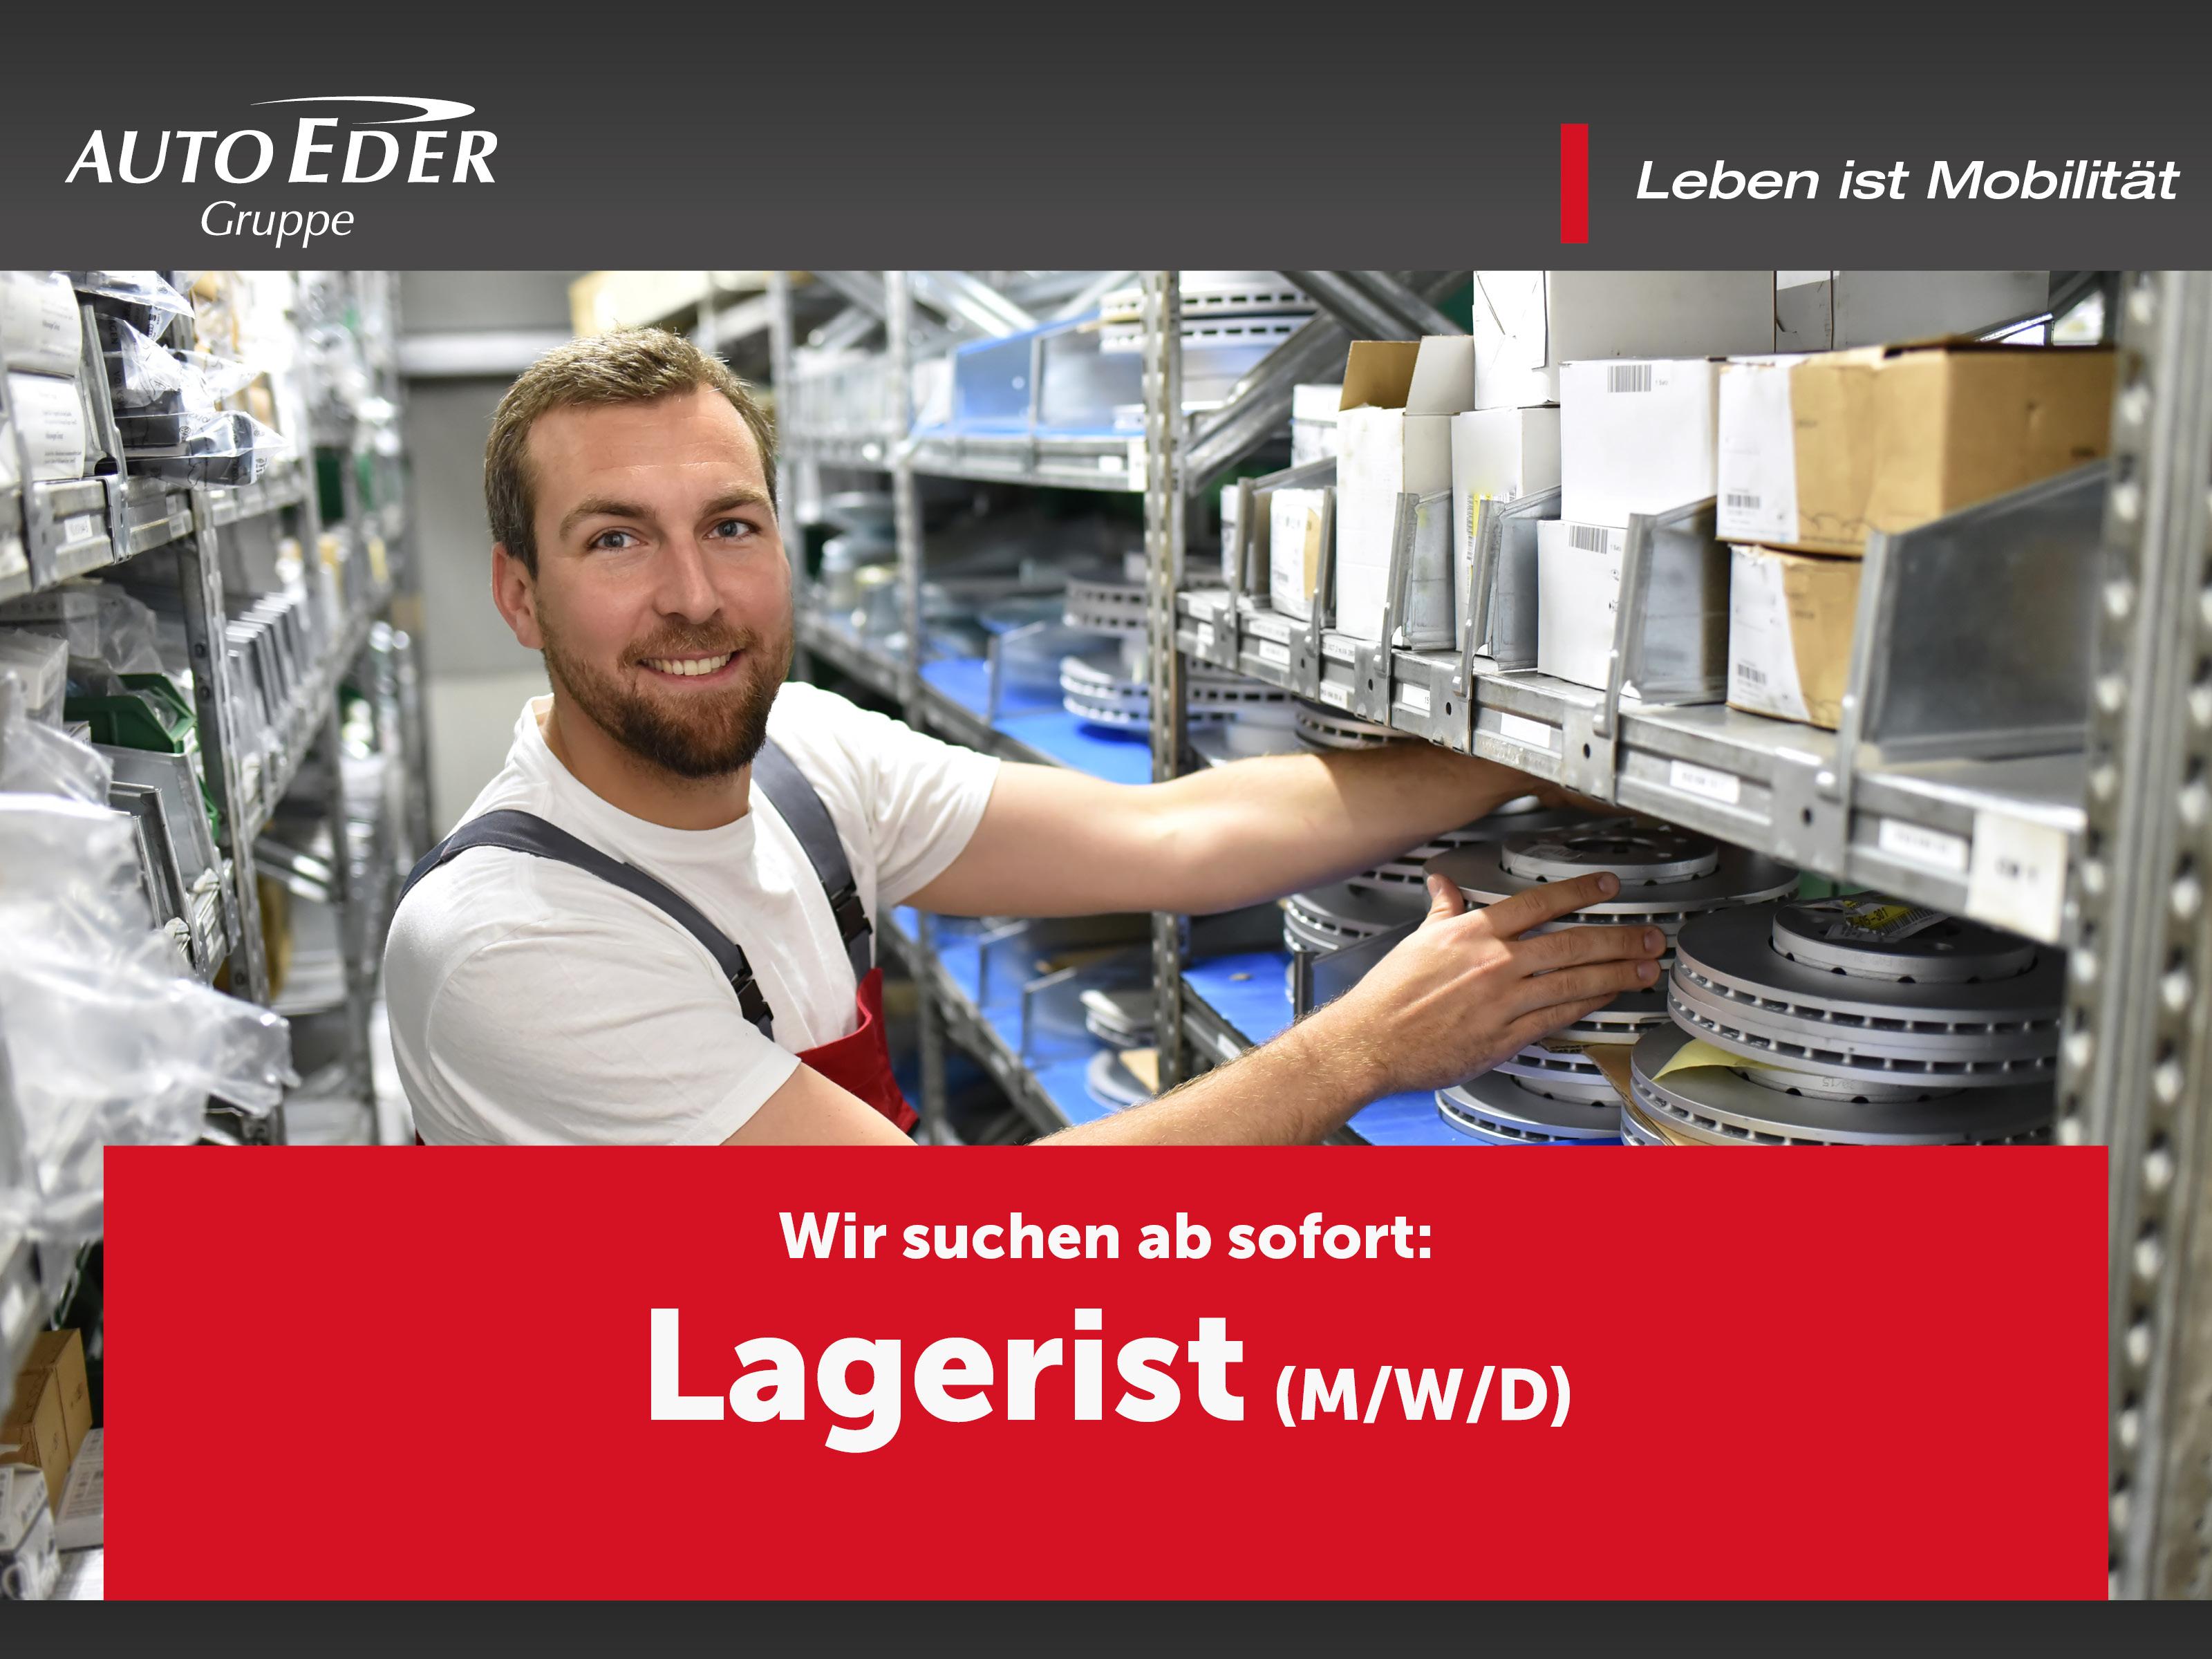 Lagerist (m/w/d)